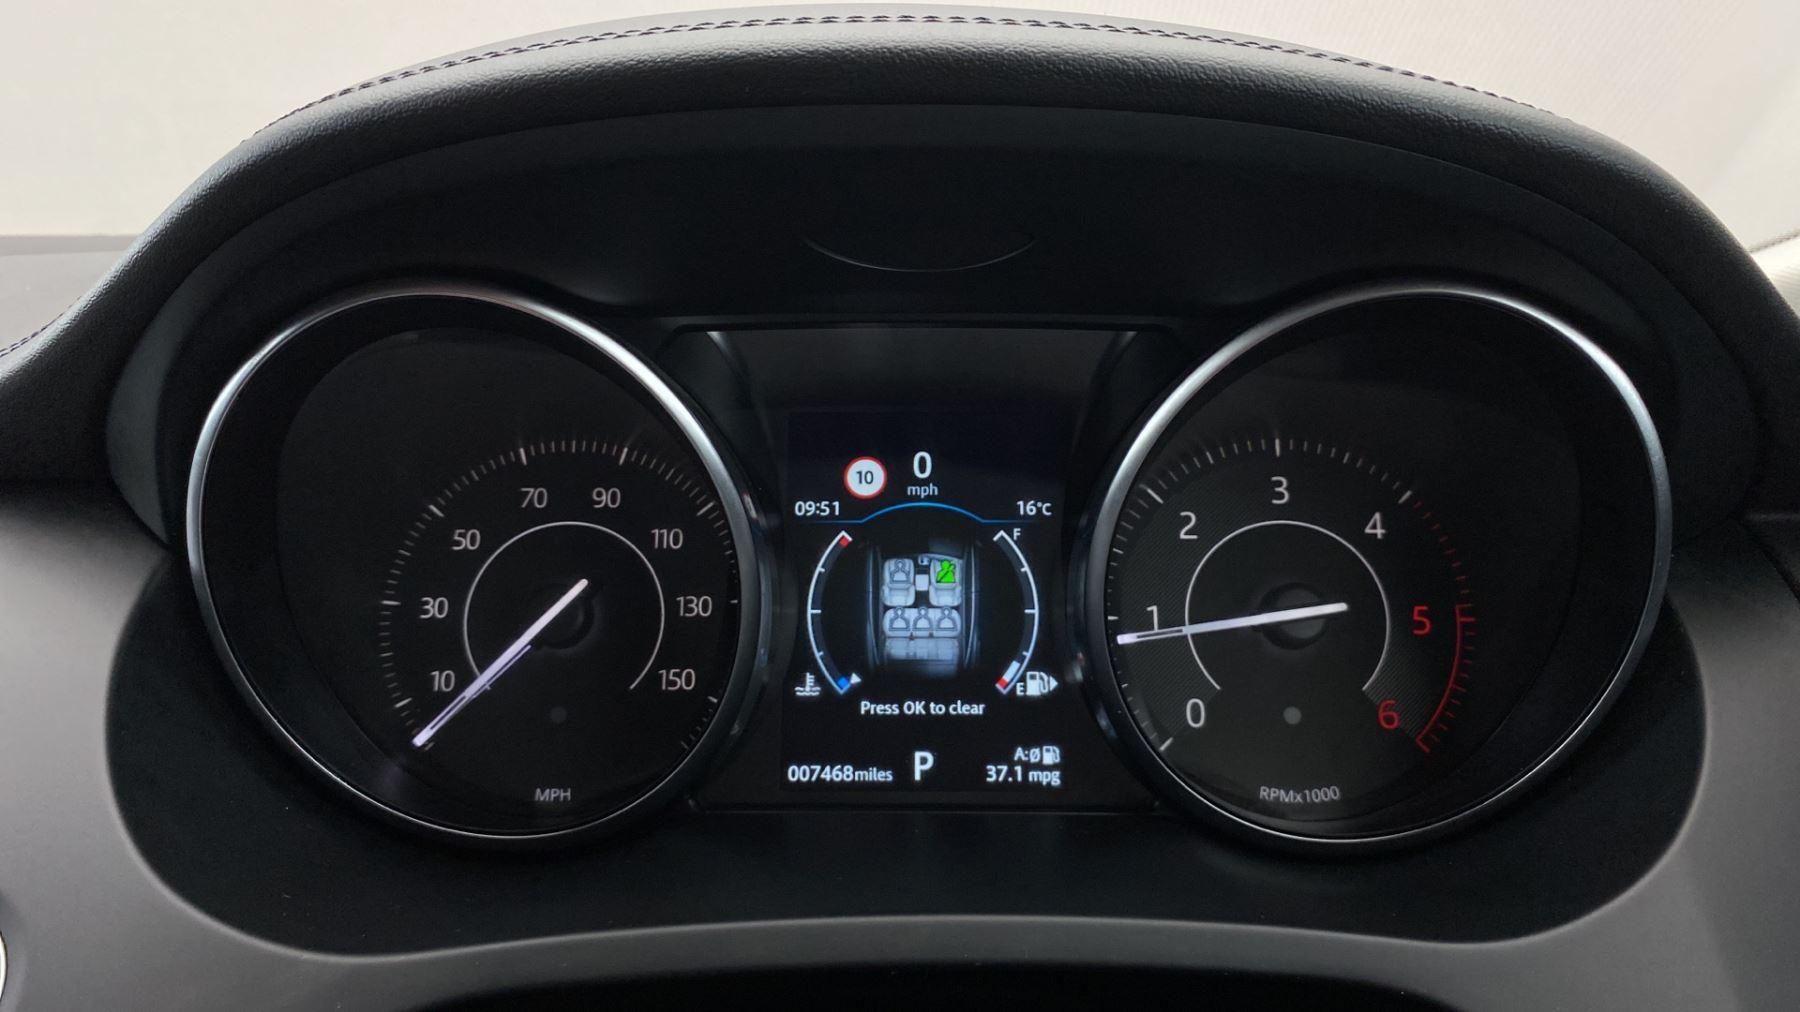 Jaguar E-PACE 2.0d SE AWD - Meridian Sound System - Powered Seats - Satellite Navigation image 13